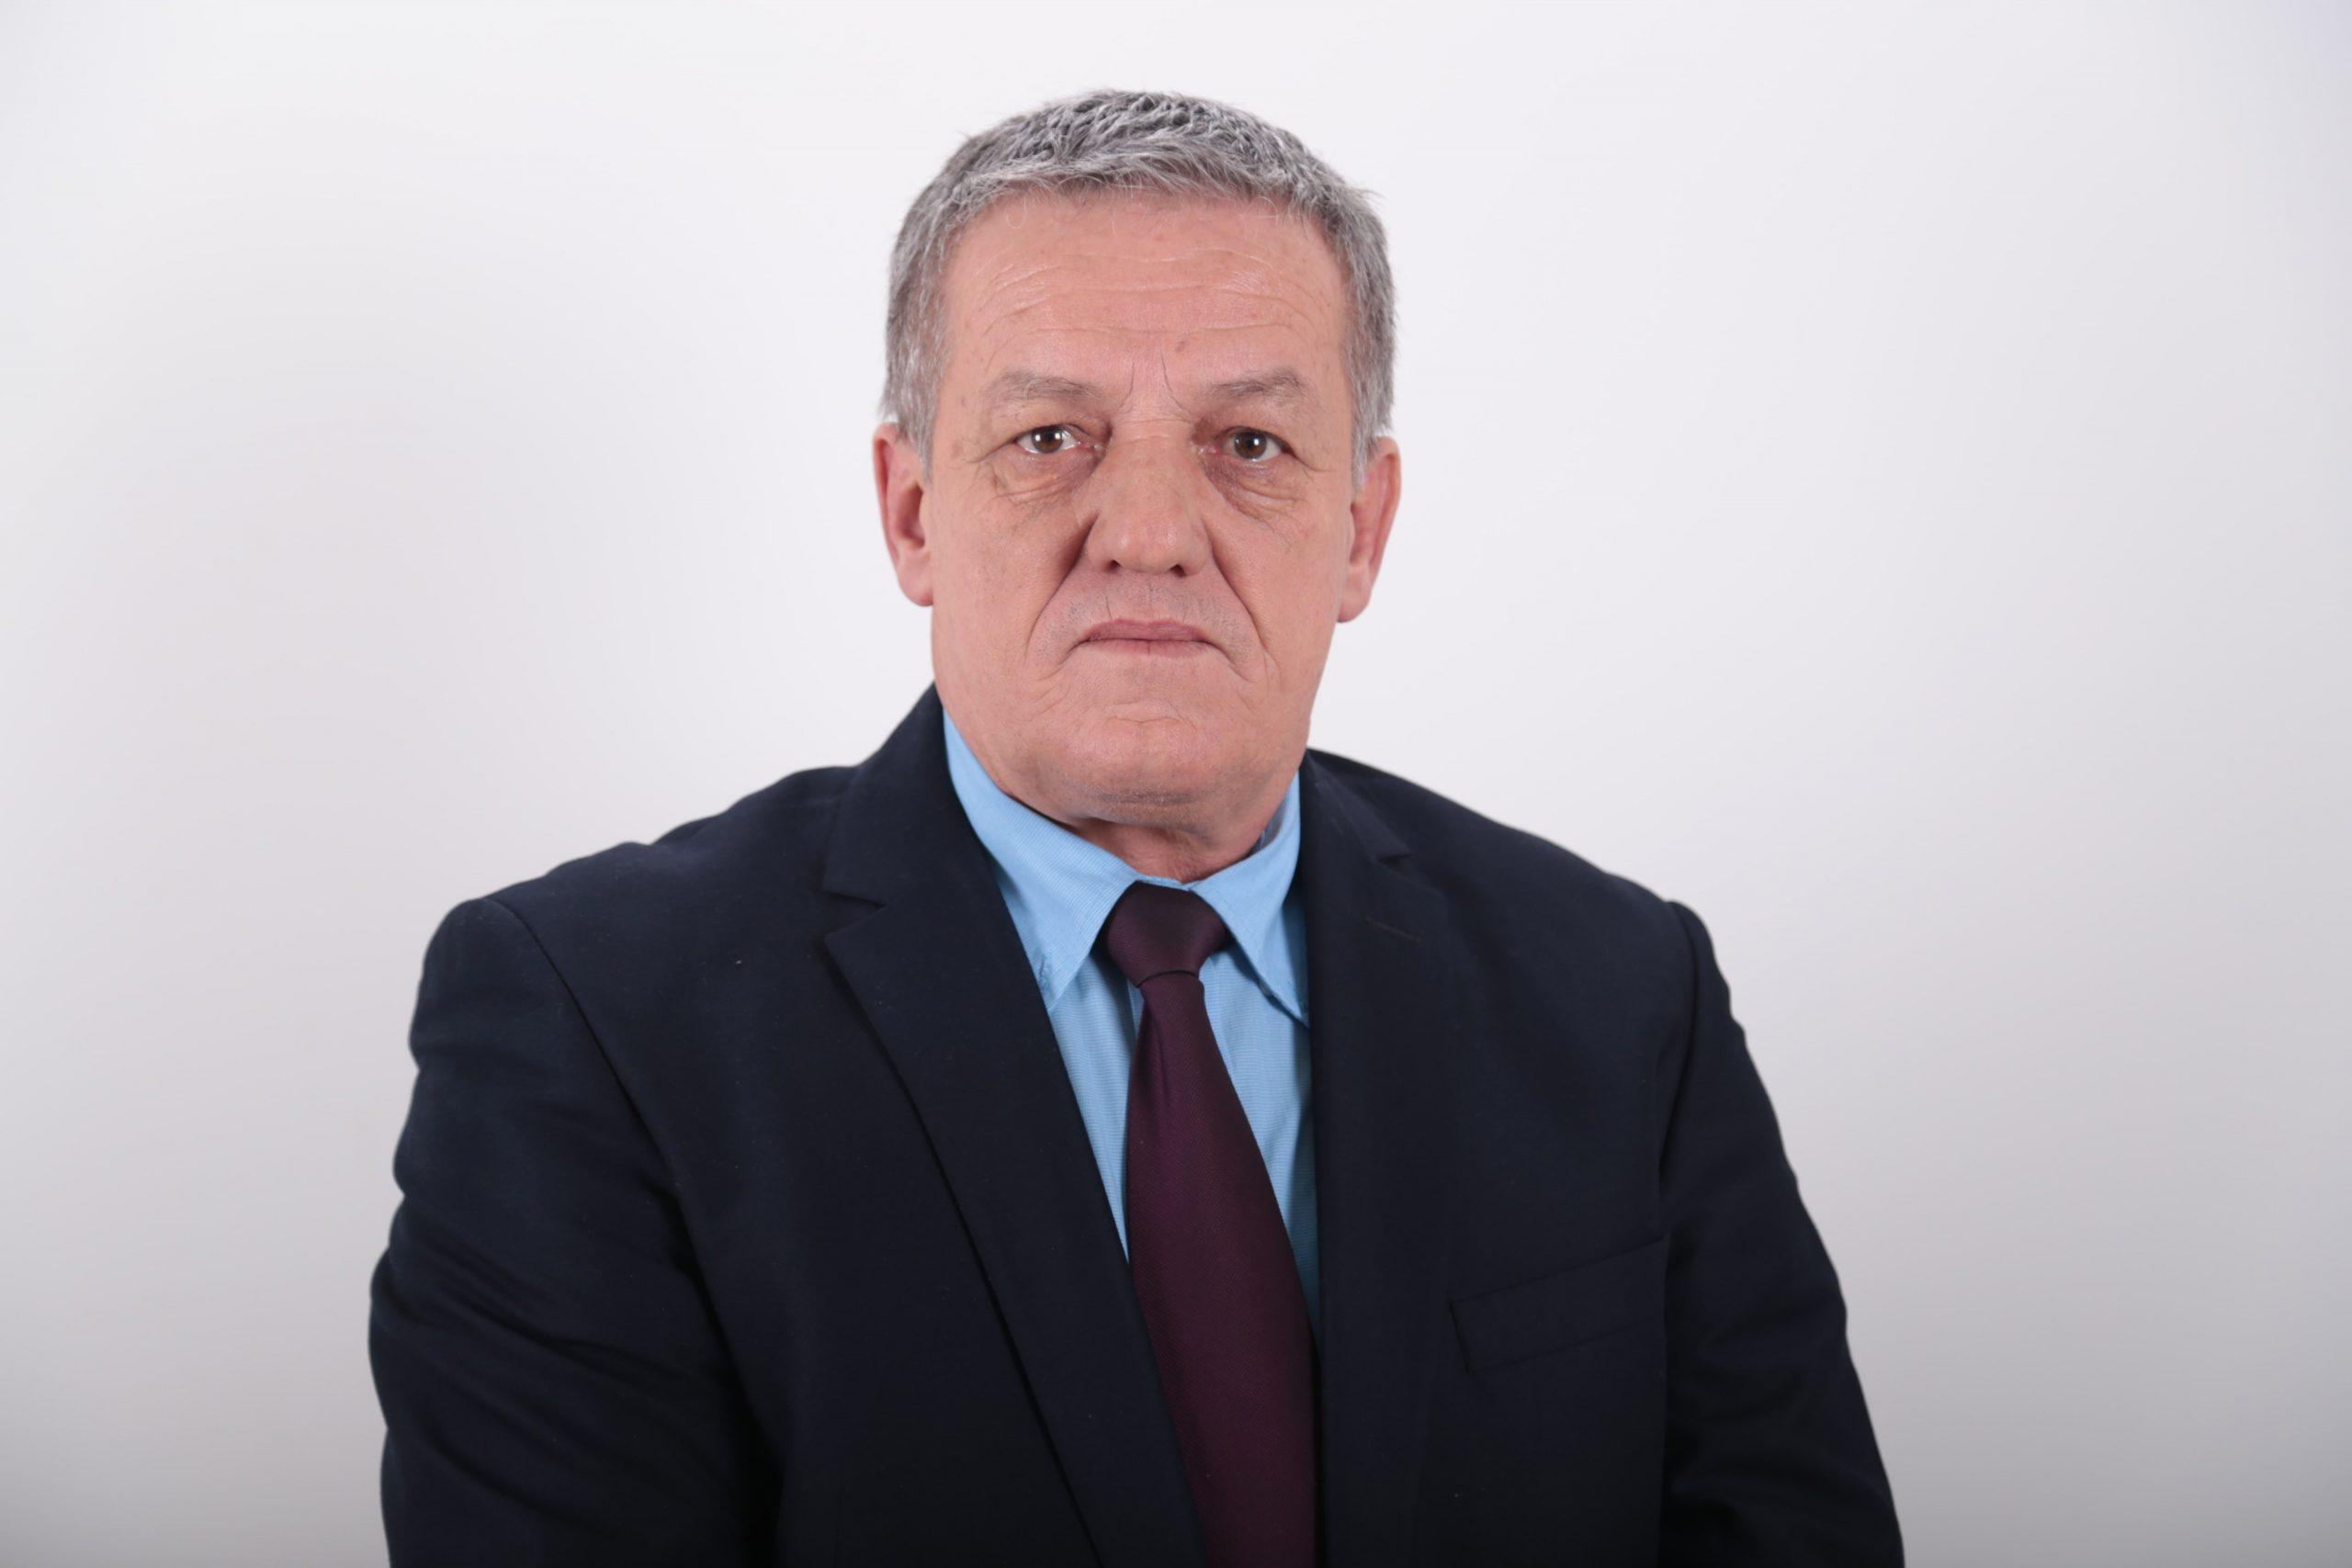 Arsim Gerxhaliu